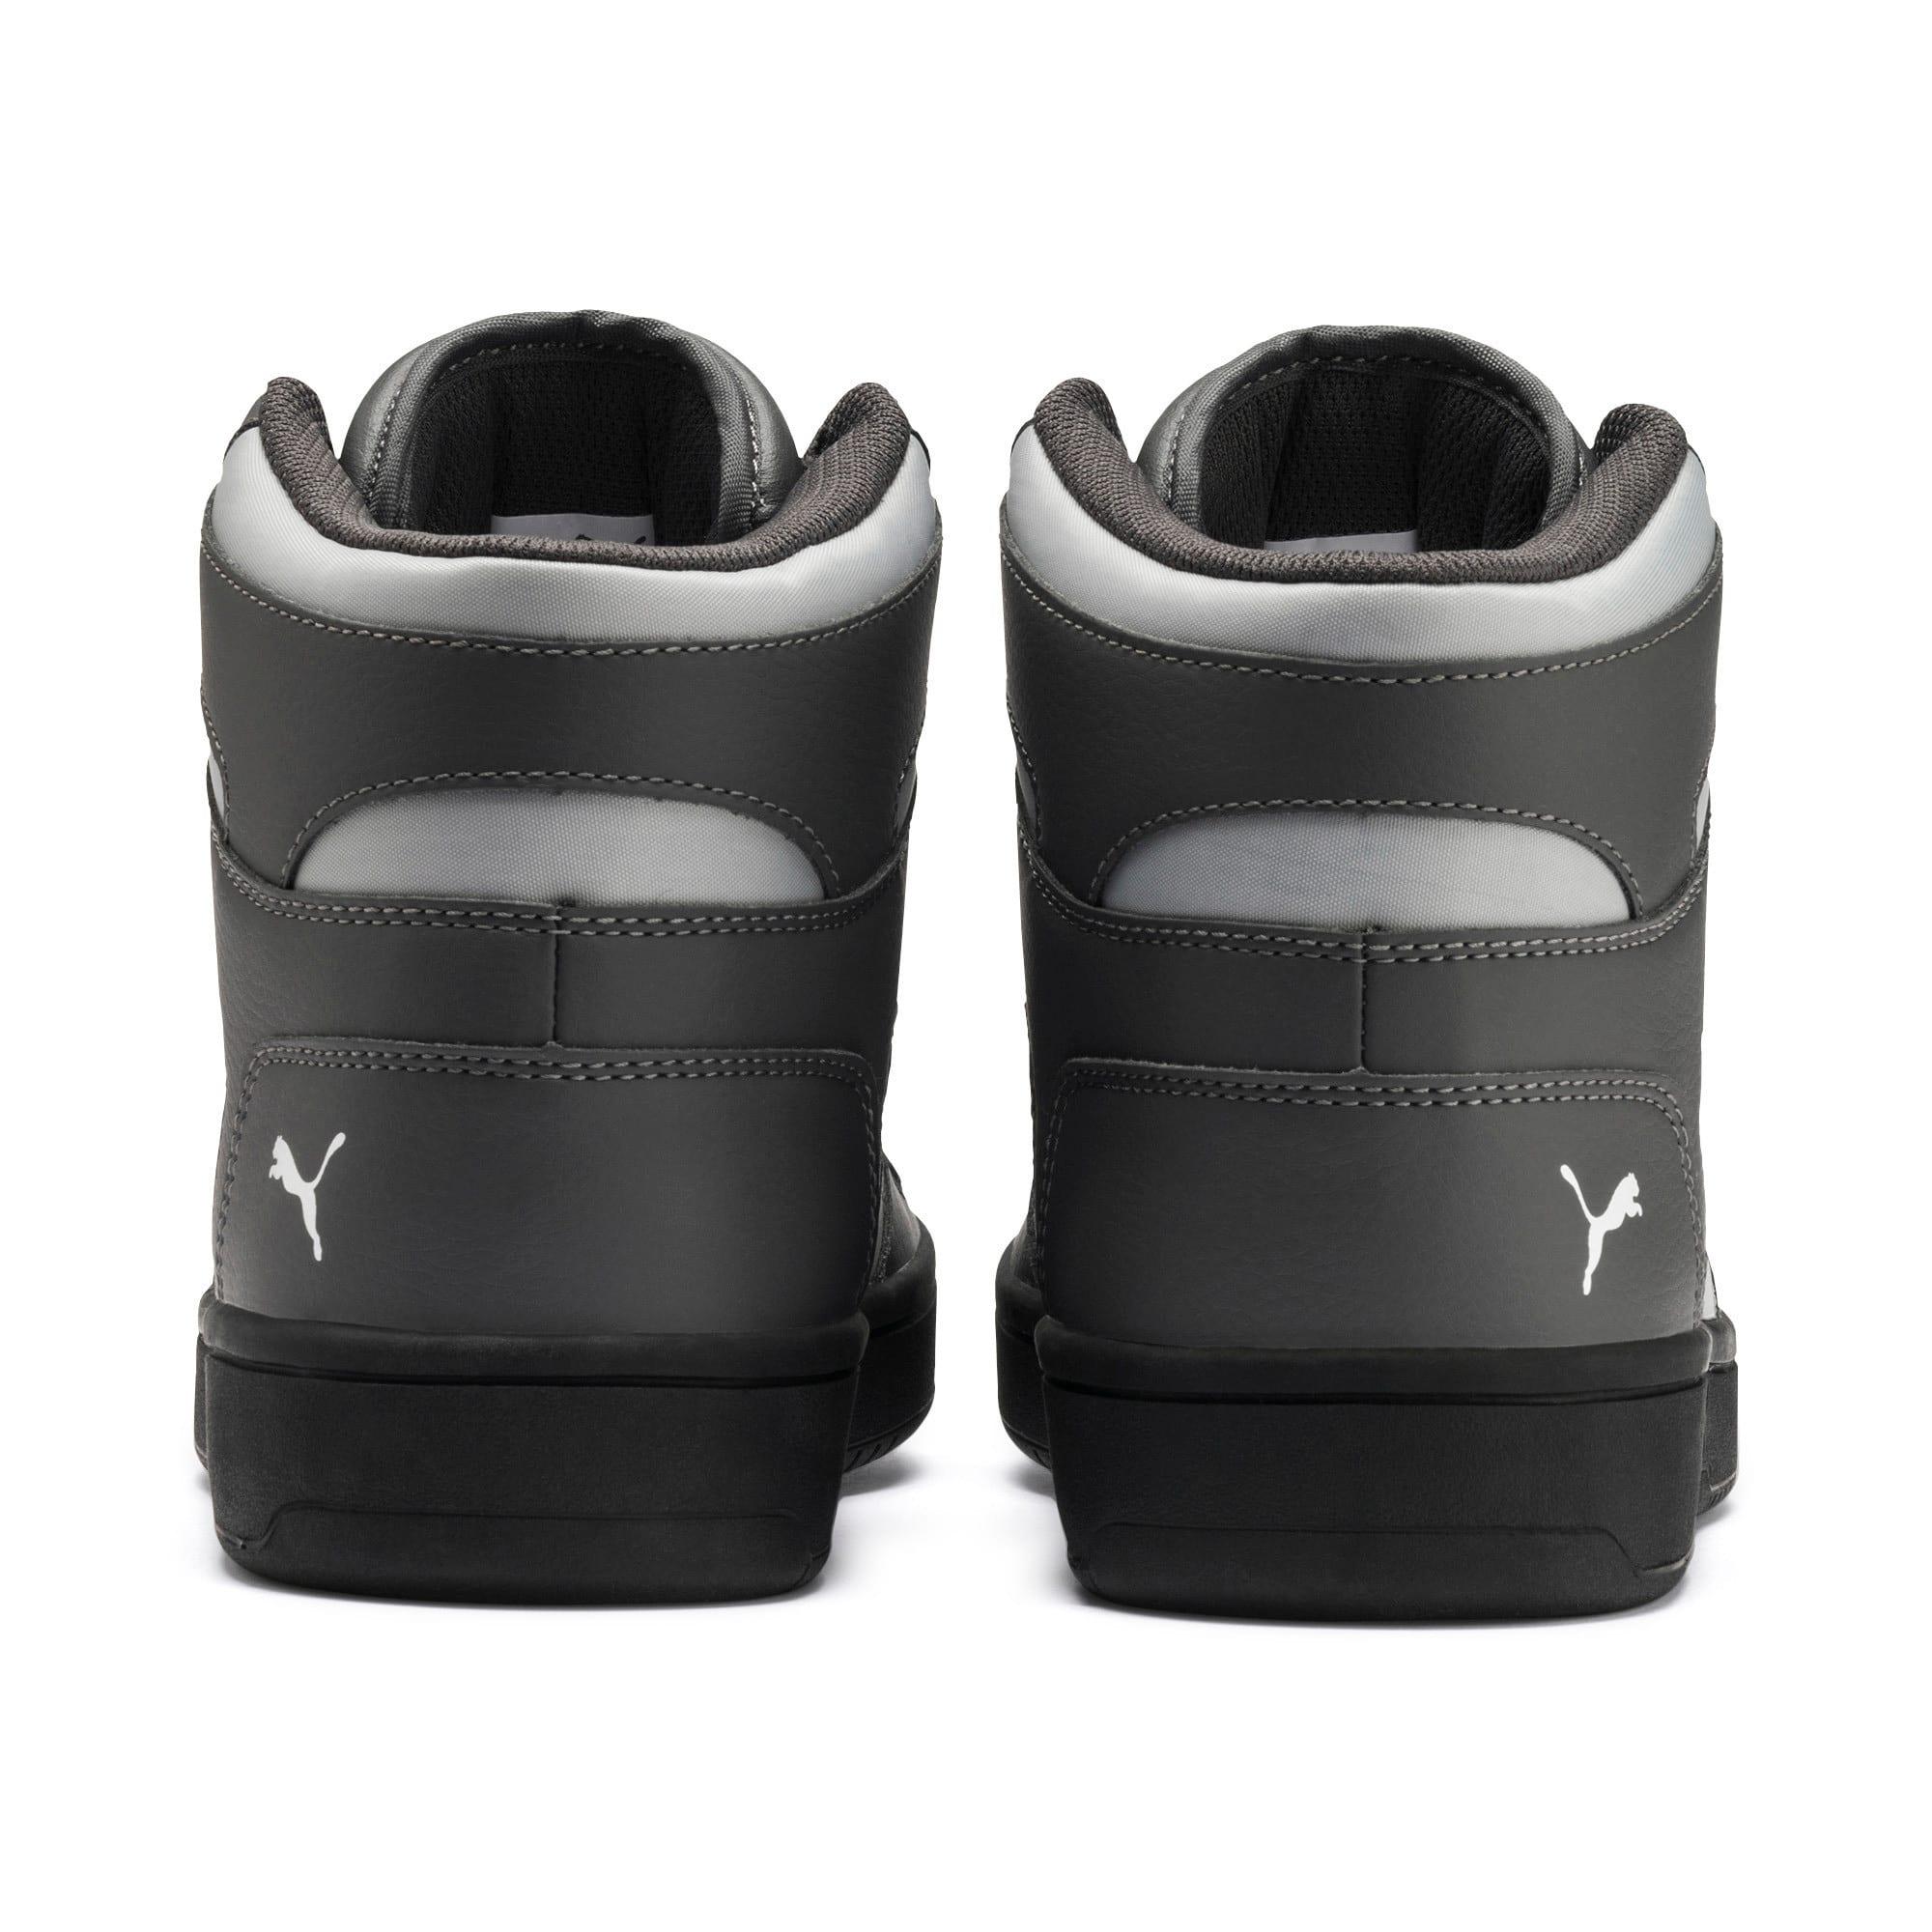 Thumbnail 4 of PUMA Rebound LayUp Sneakers, CASTLEROCK-HRise-White-Black, medium